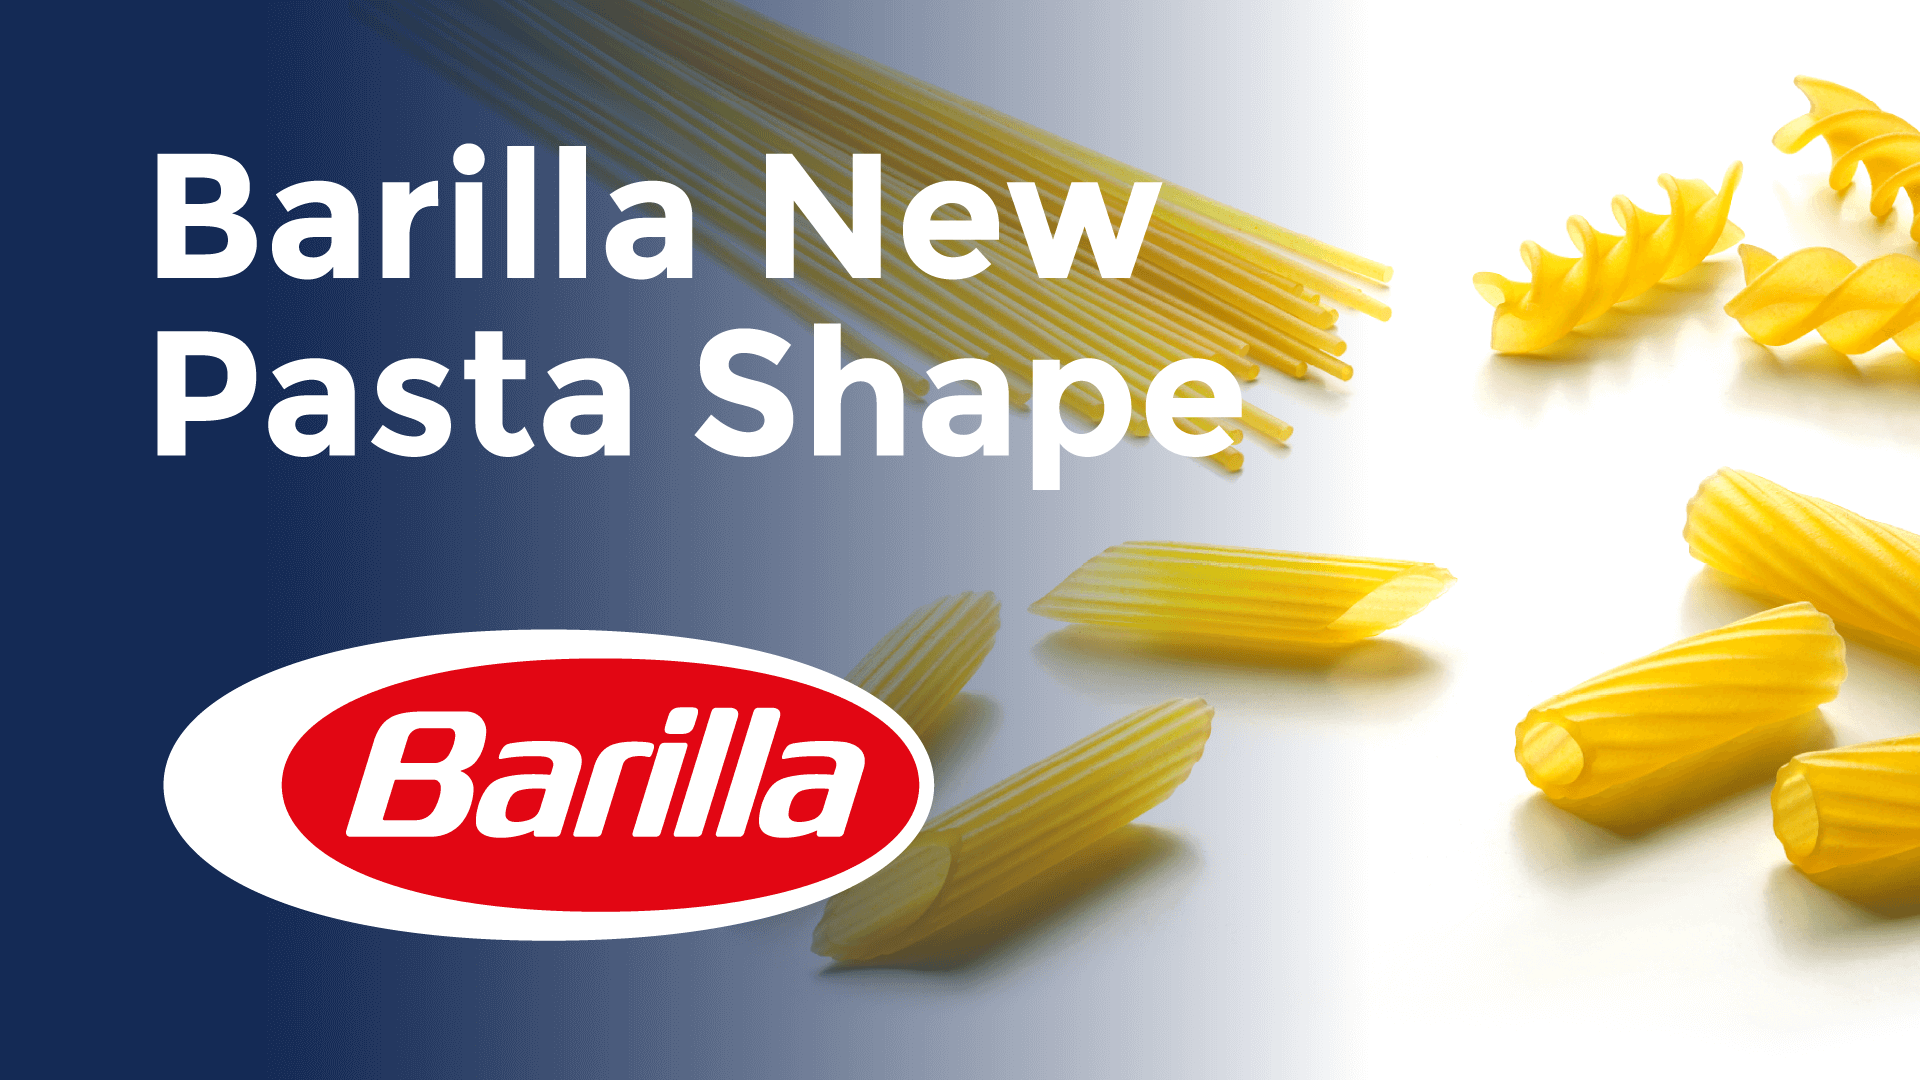 Barilla New Pasta Shape